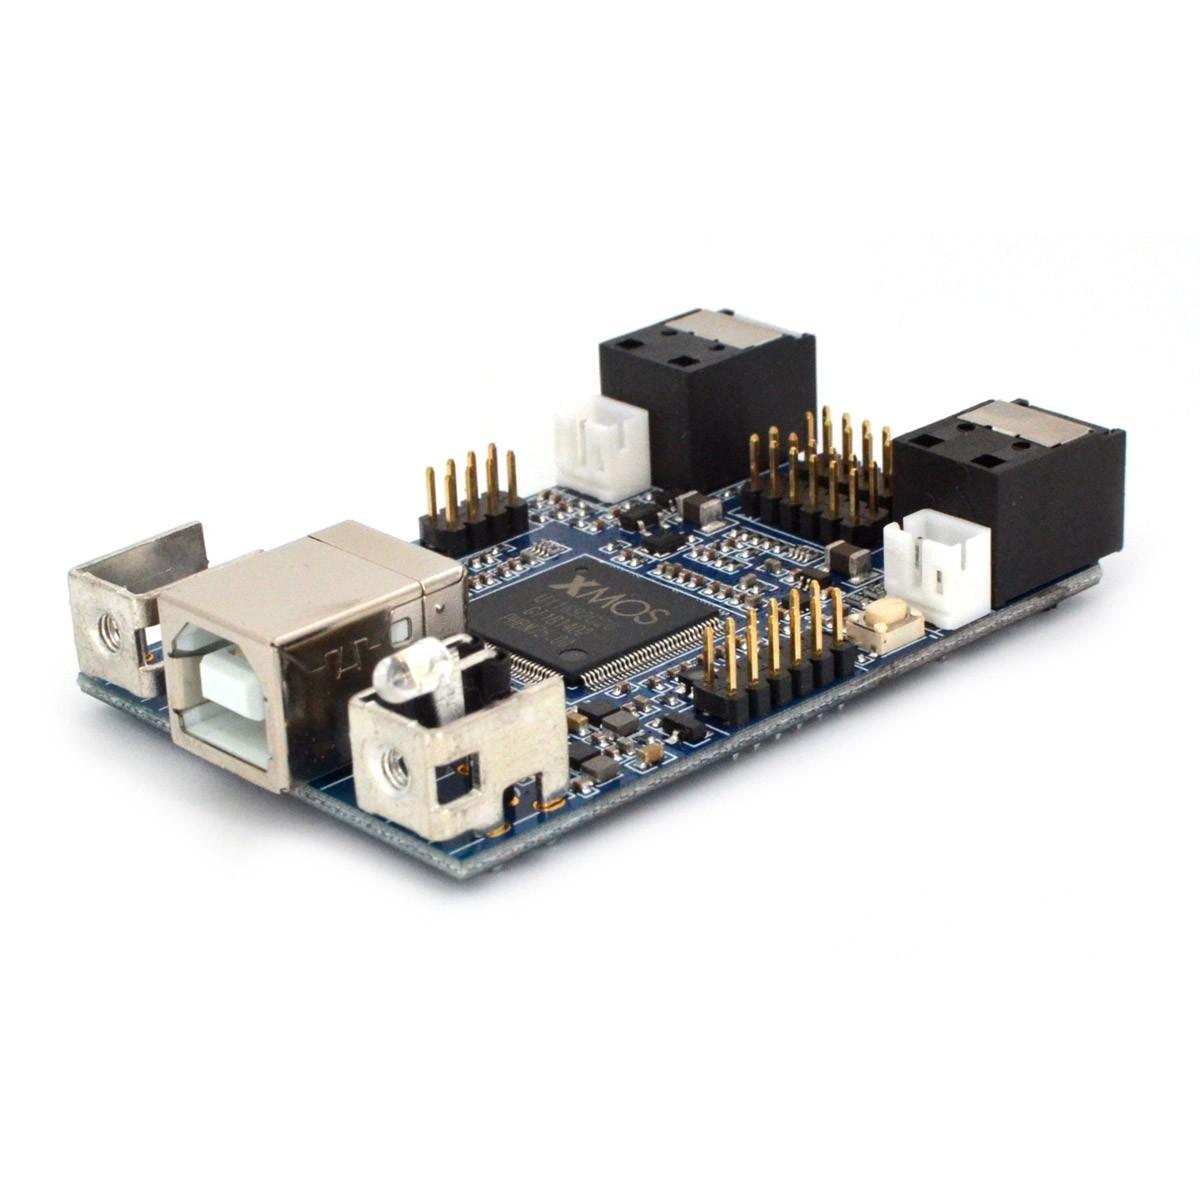 MINIDSP MCH STREAMER Interface USB XMOS vers I2S / SPDIF / ADAT / TDM/ DSD / PDM 32bit 384kHz DSD256